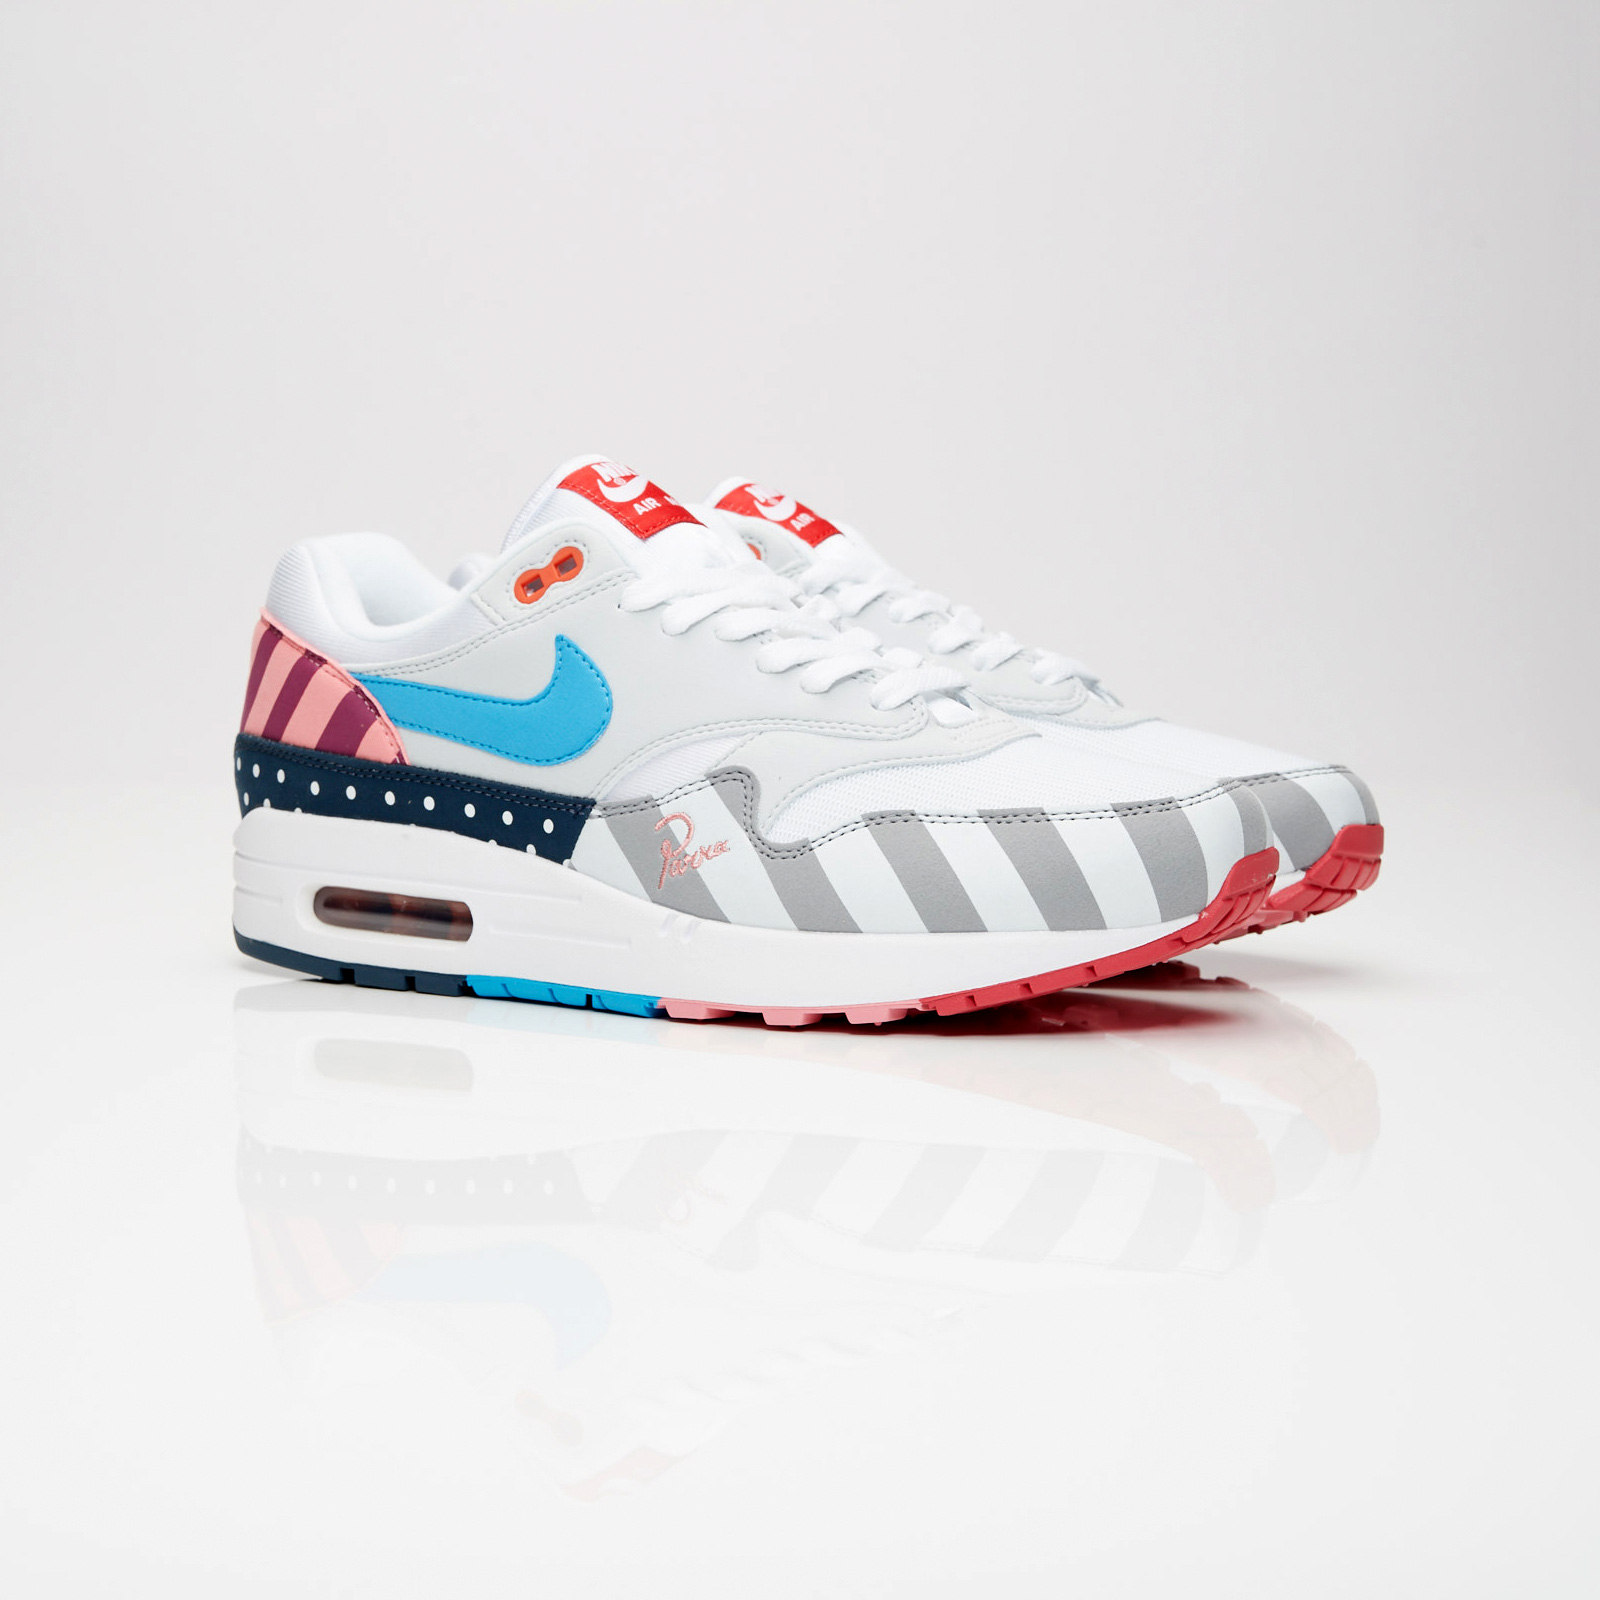 Nike Air Max 1 Parra - At3057-100 - Sneakersnstuff  0b1efd158